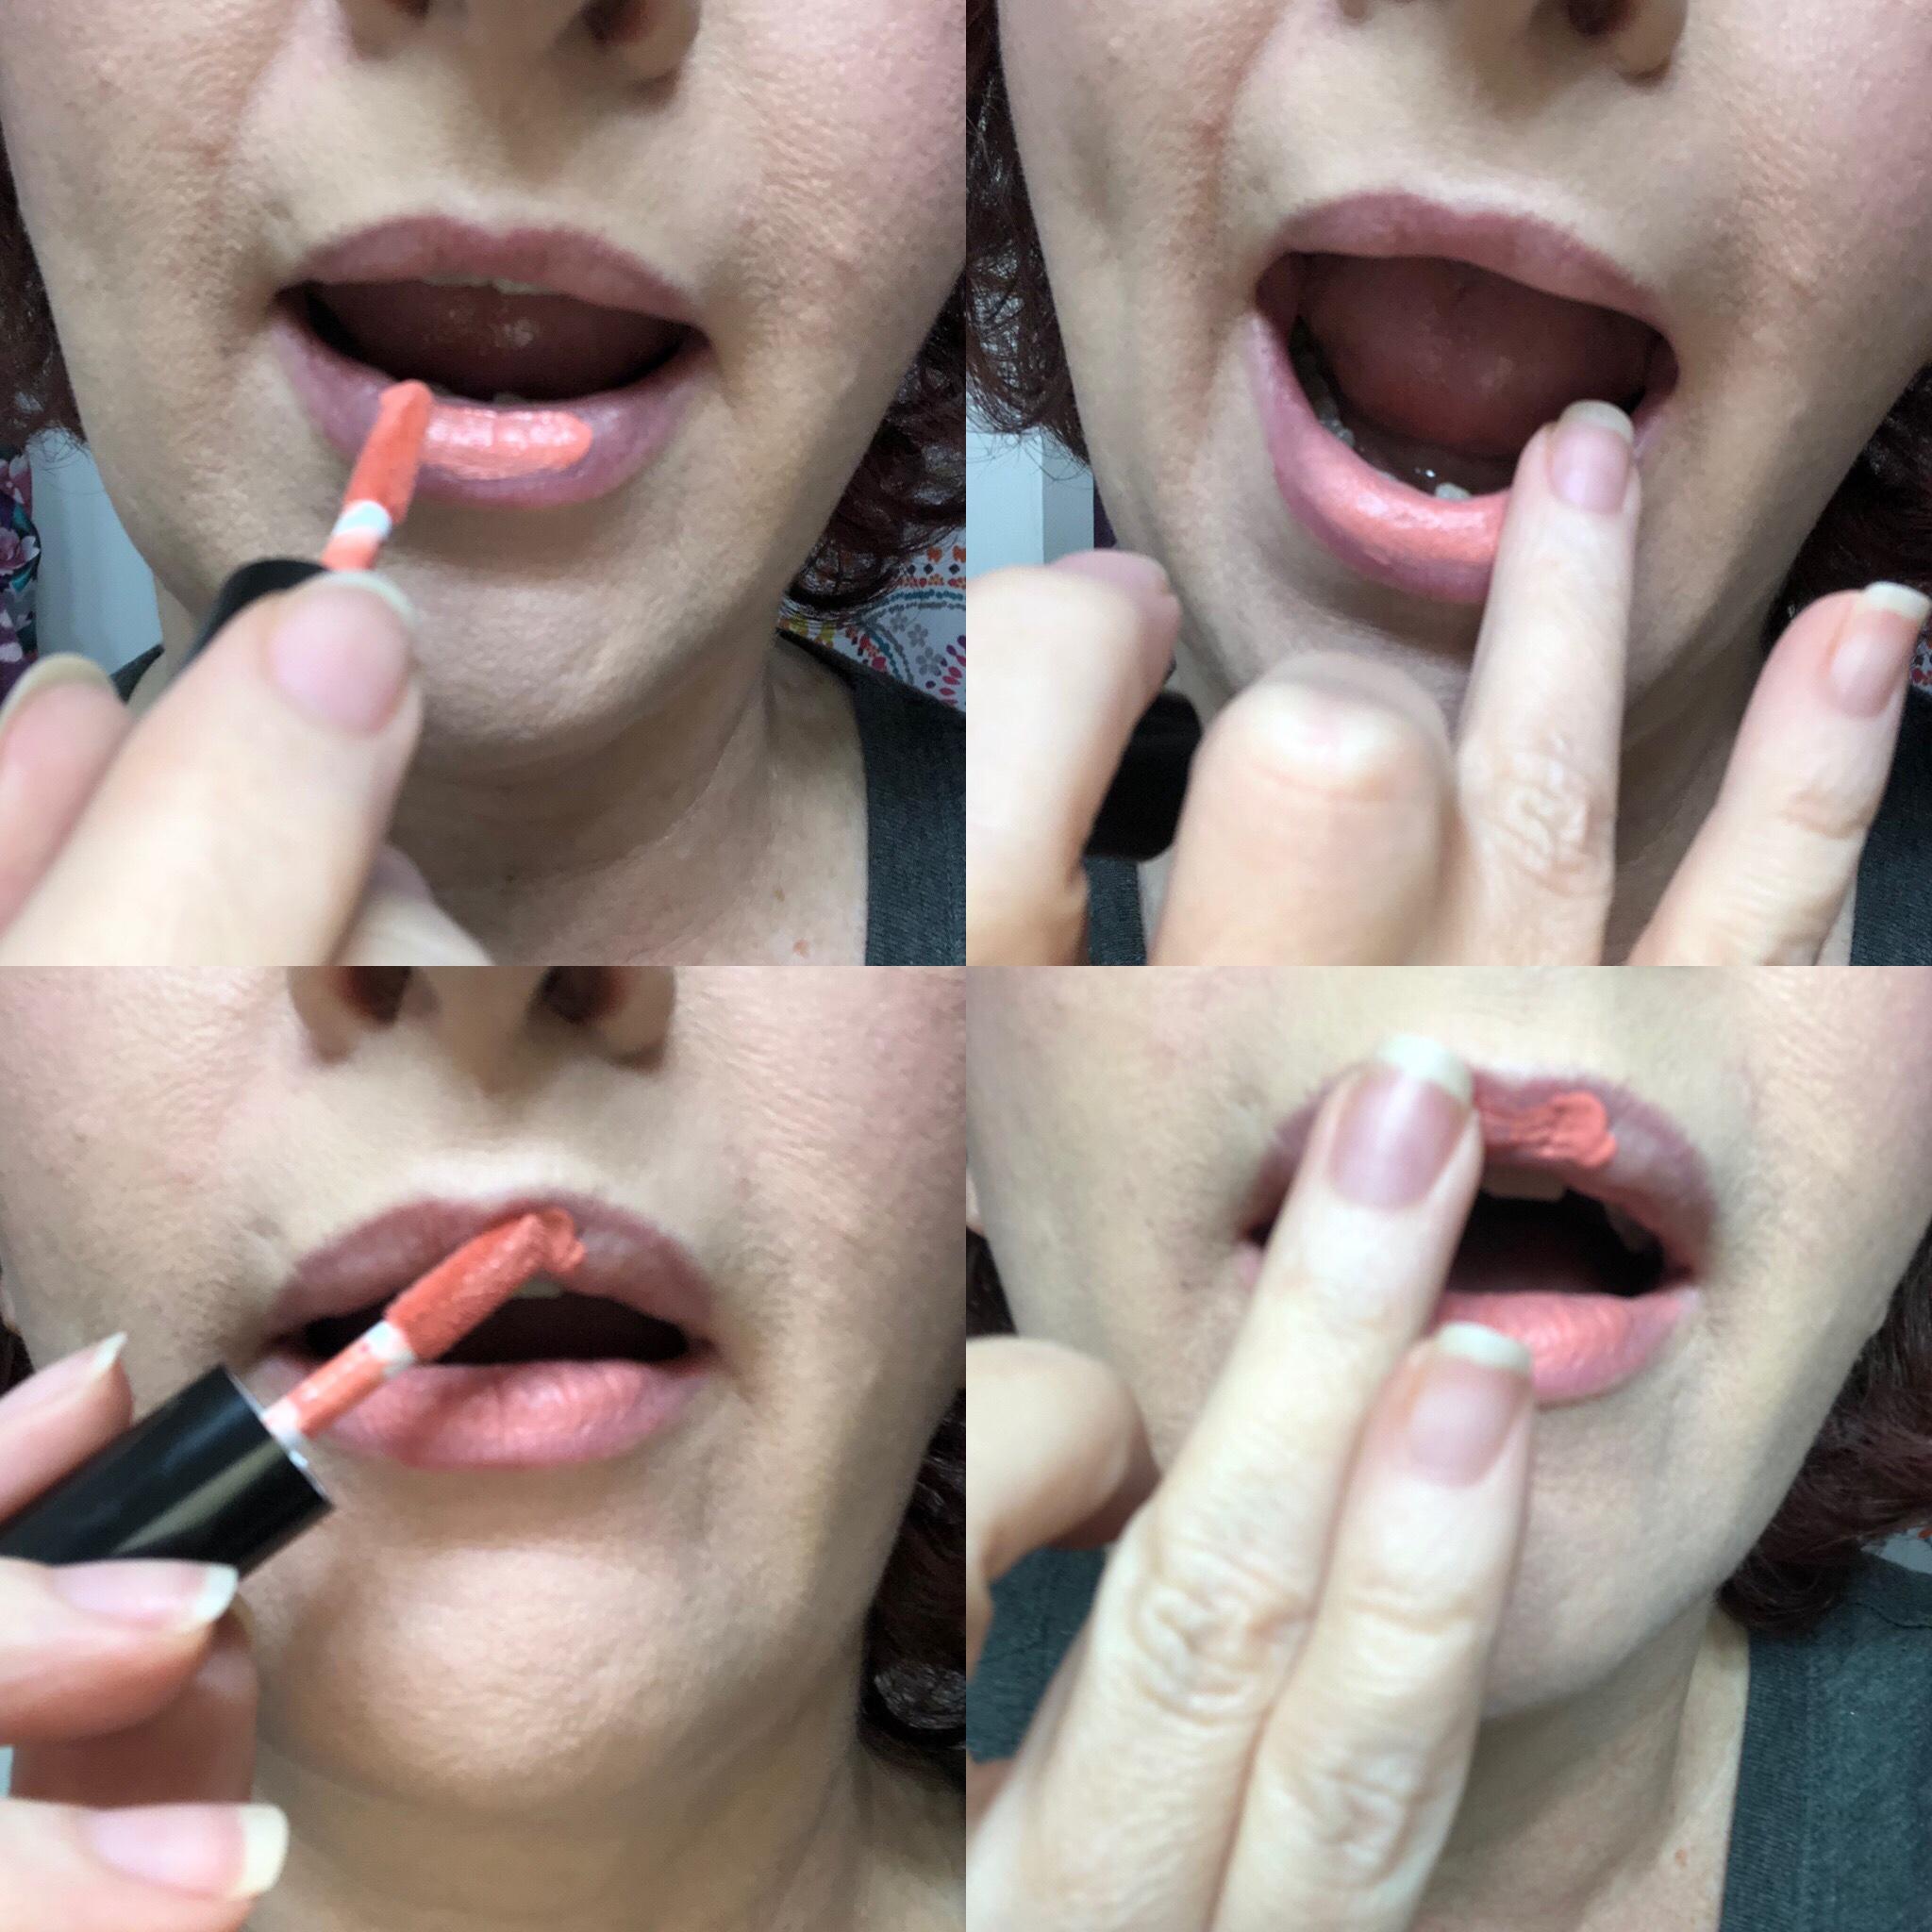 Nyx Sweet Chateau Slip Tease Lip Vault application tips